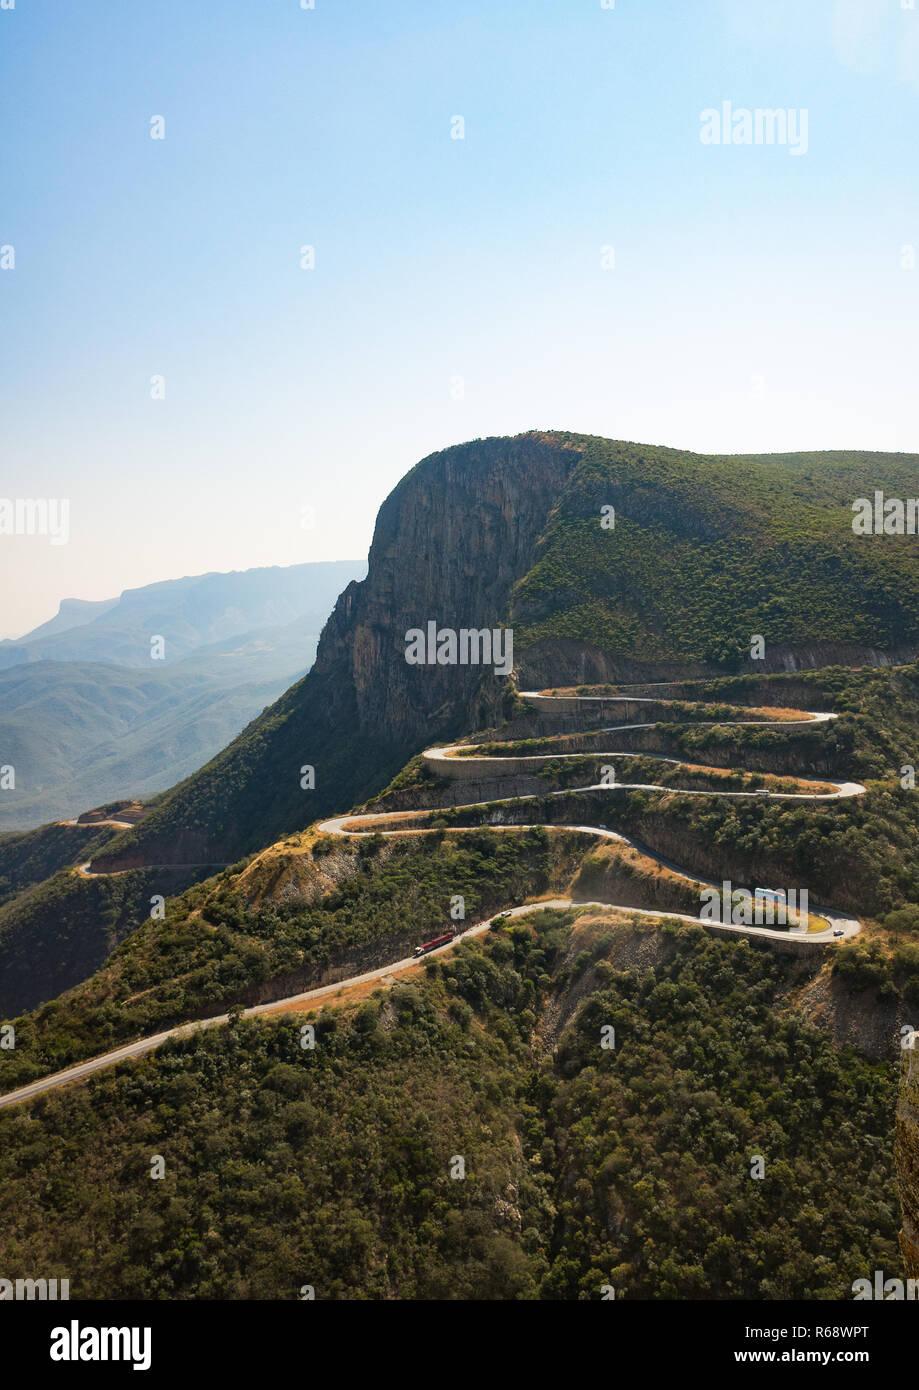 The winding road at serra da Leba overlooking the cliffs, Huila Province, Lubango, Angola - Stock Image